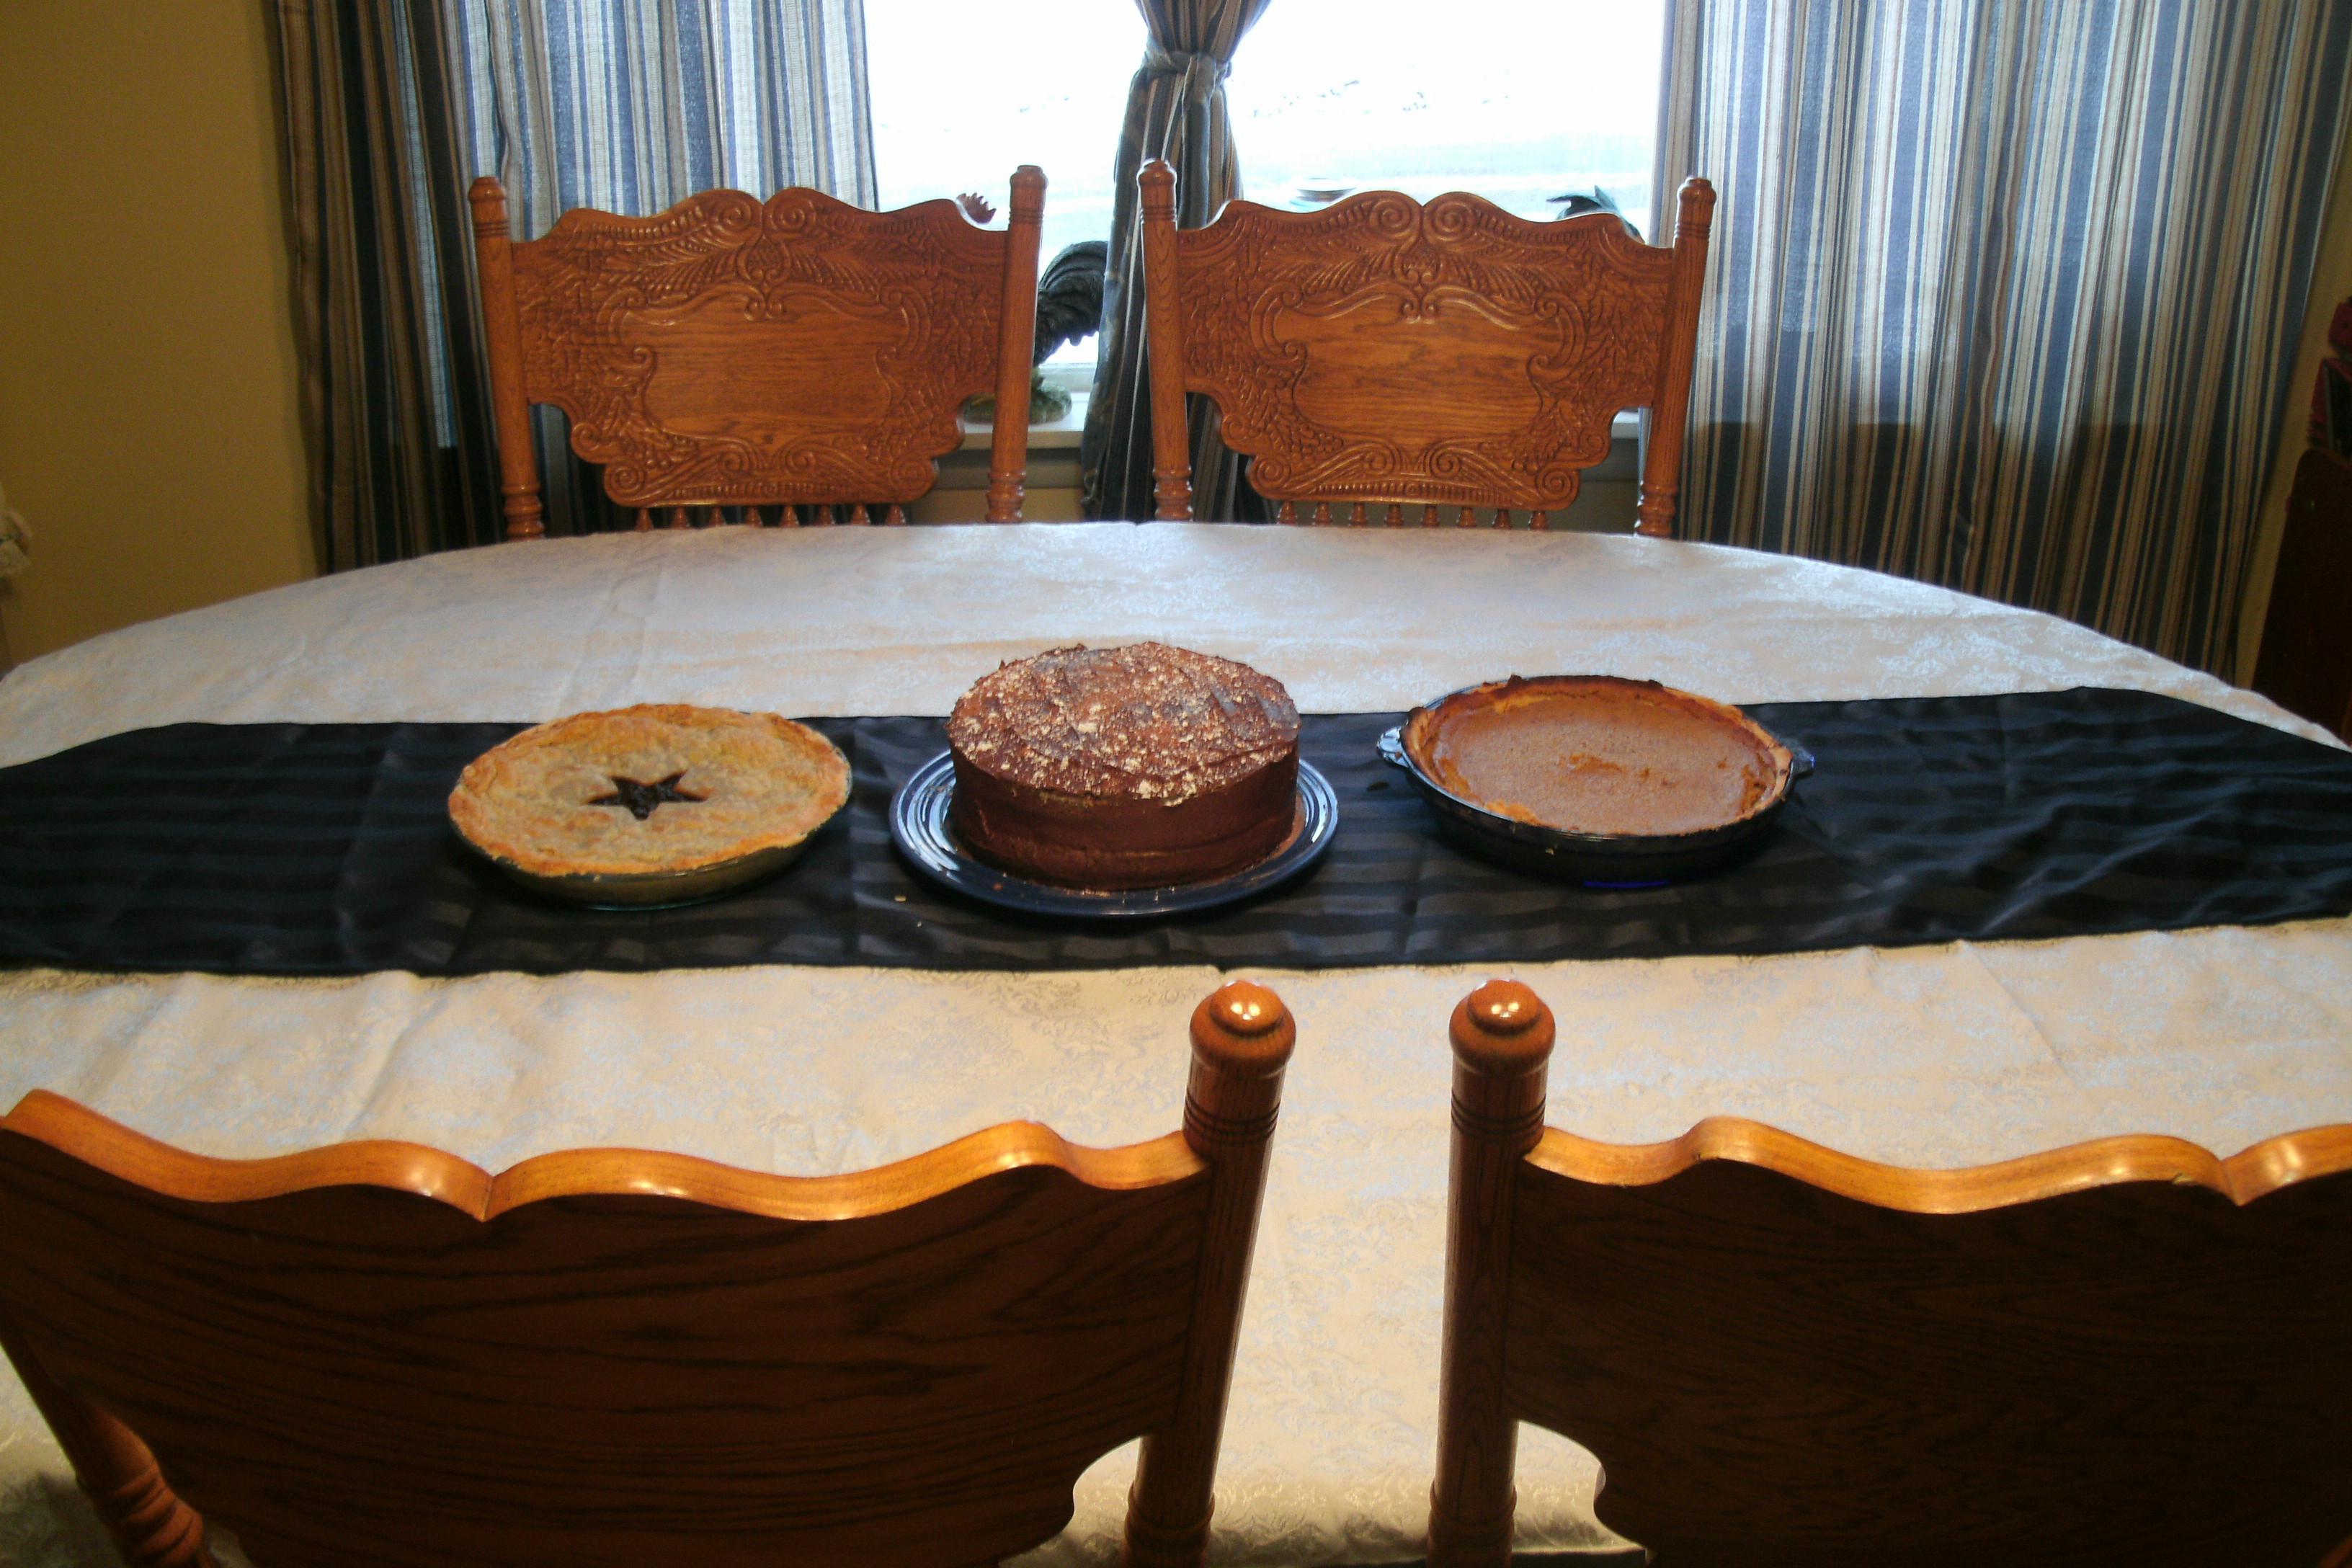 mock mincemeat, pumpkin pie and chocolate cake